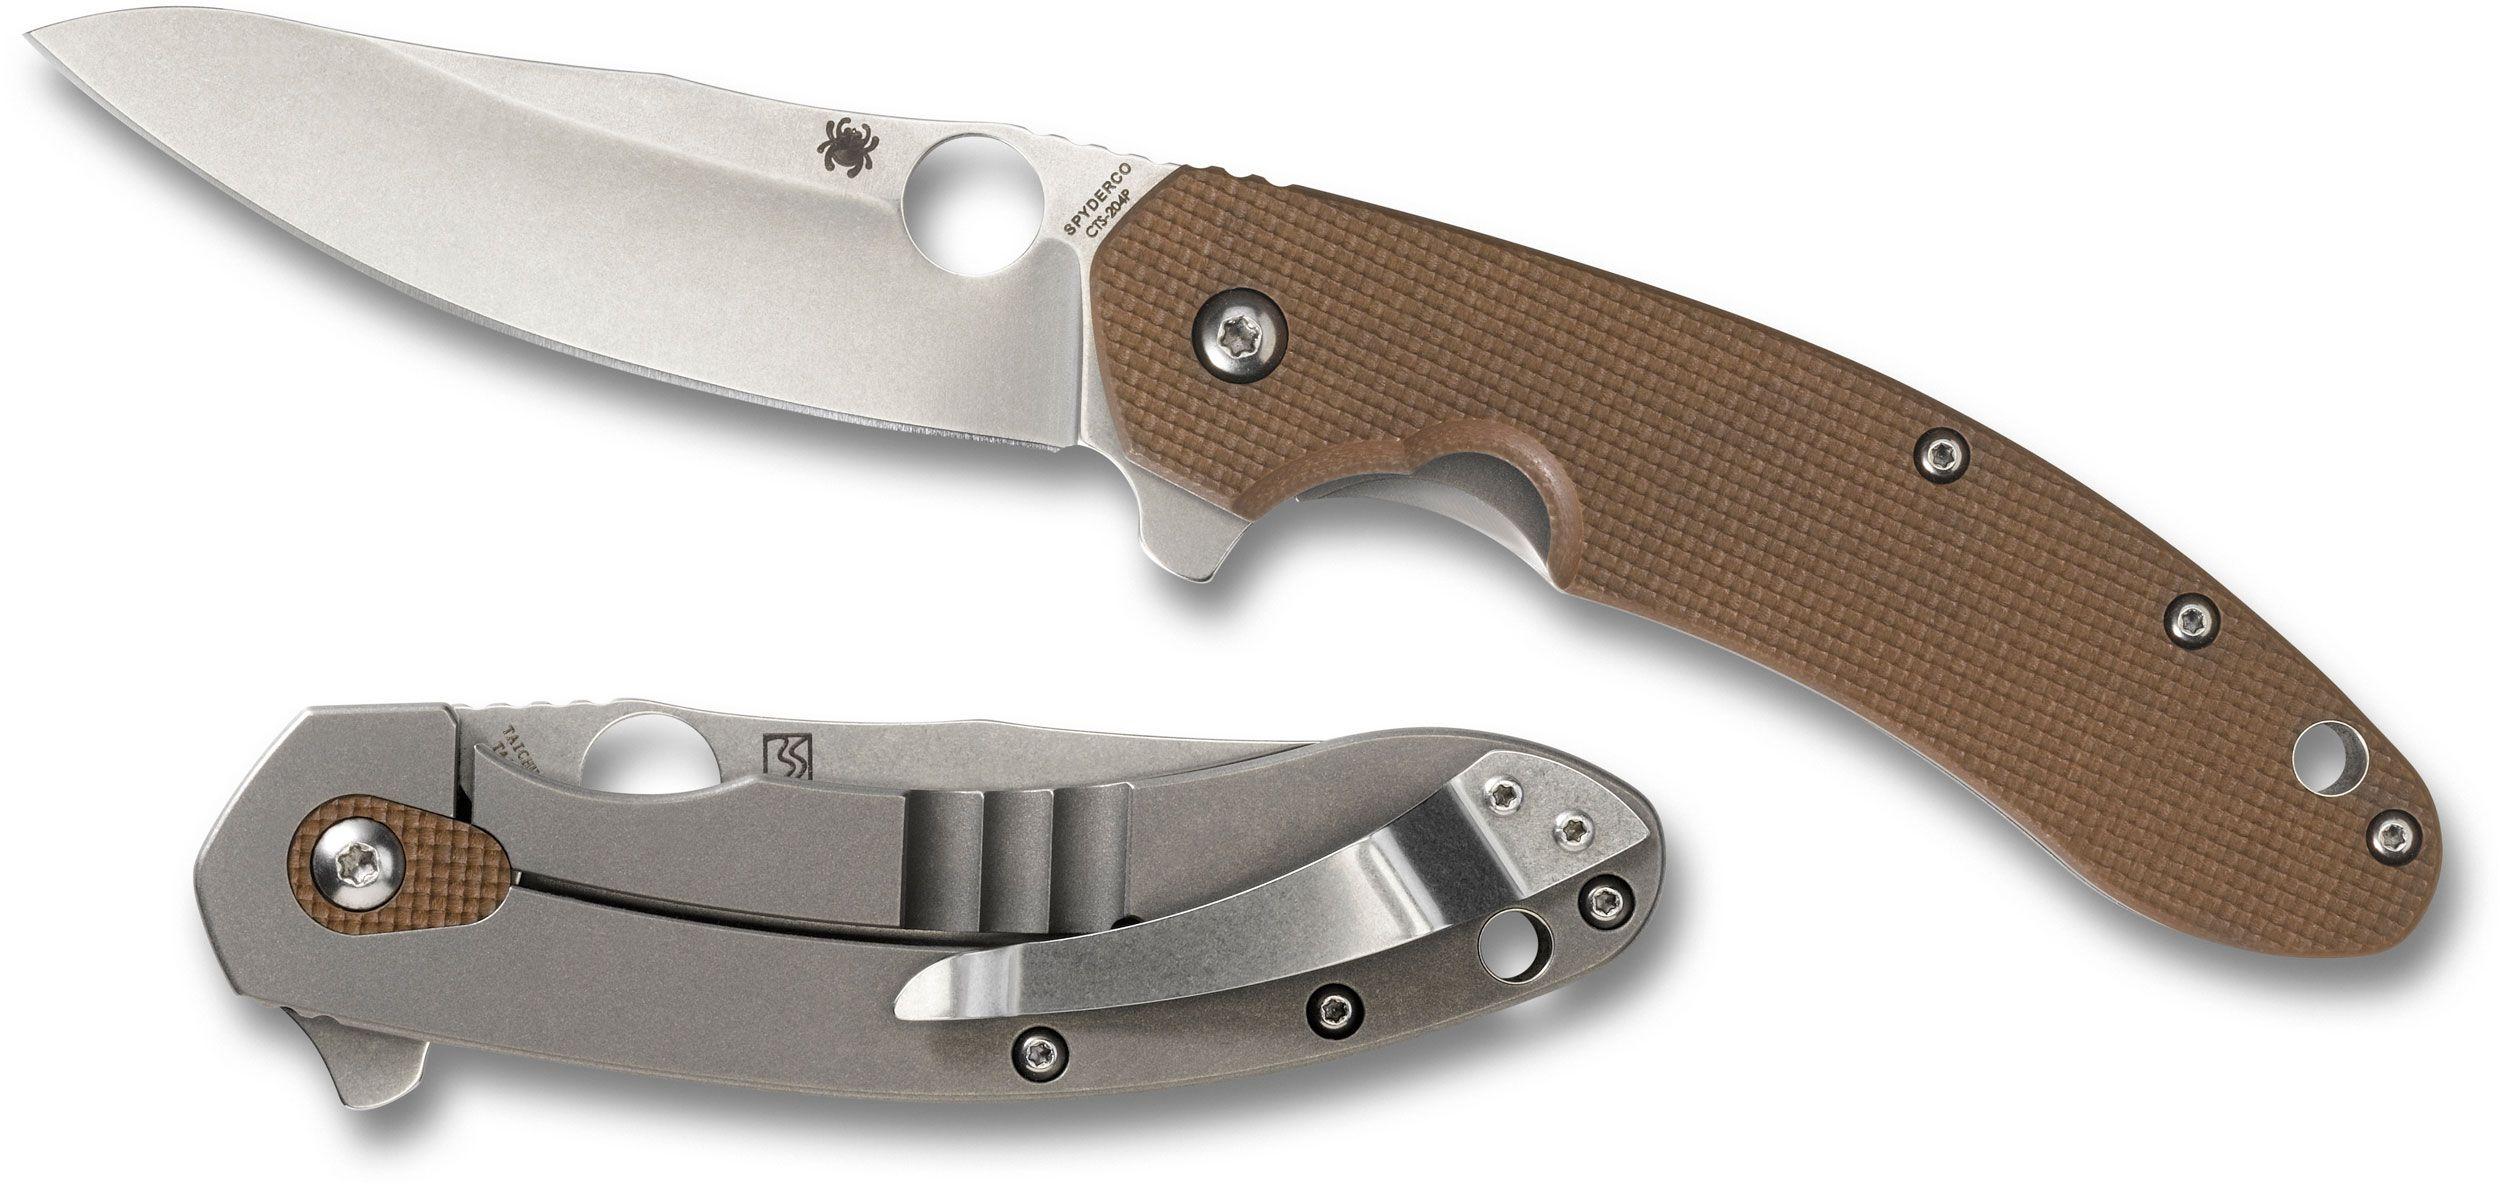 Spyderco C156GPBN Brad Southard Flipper 3.46 inch CTS-204P Carpenter Steel Blade, Brown G10 Handle